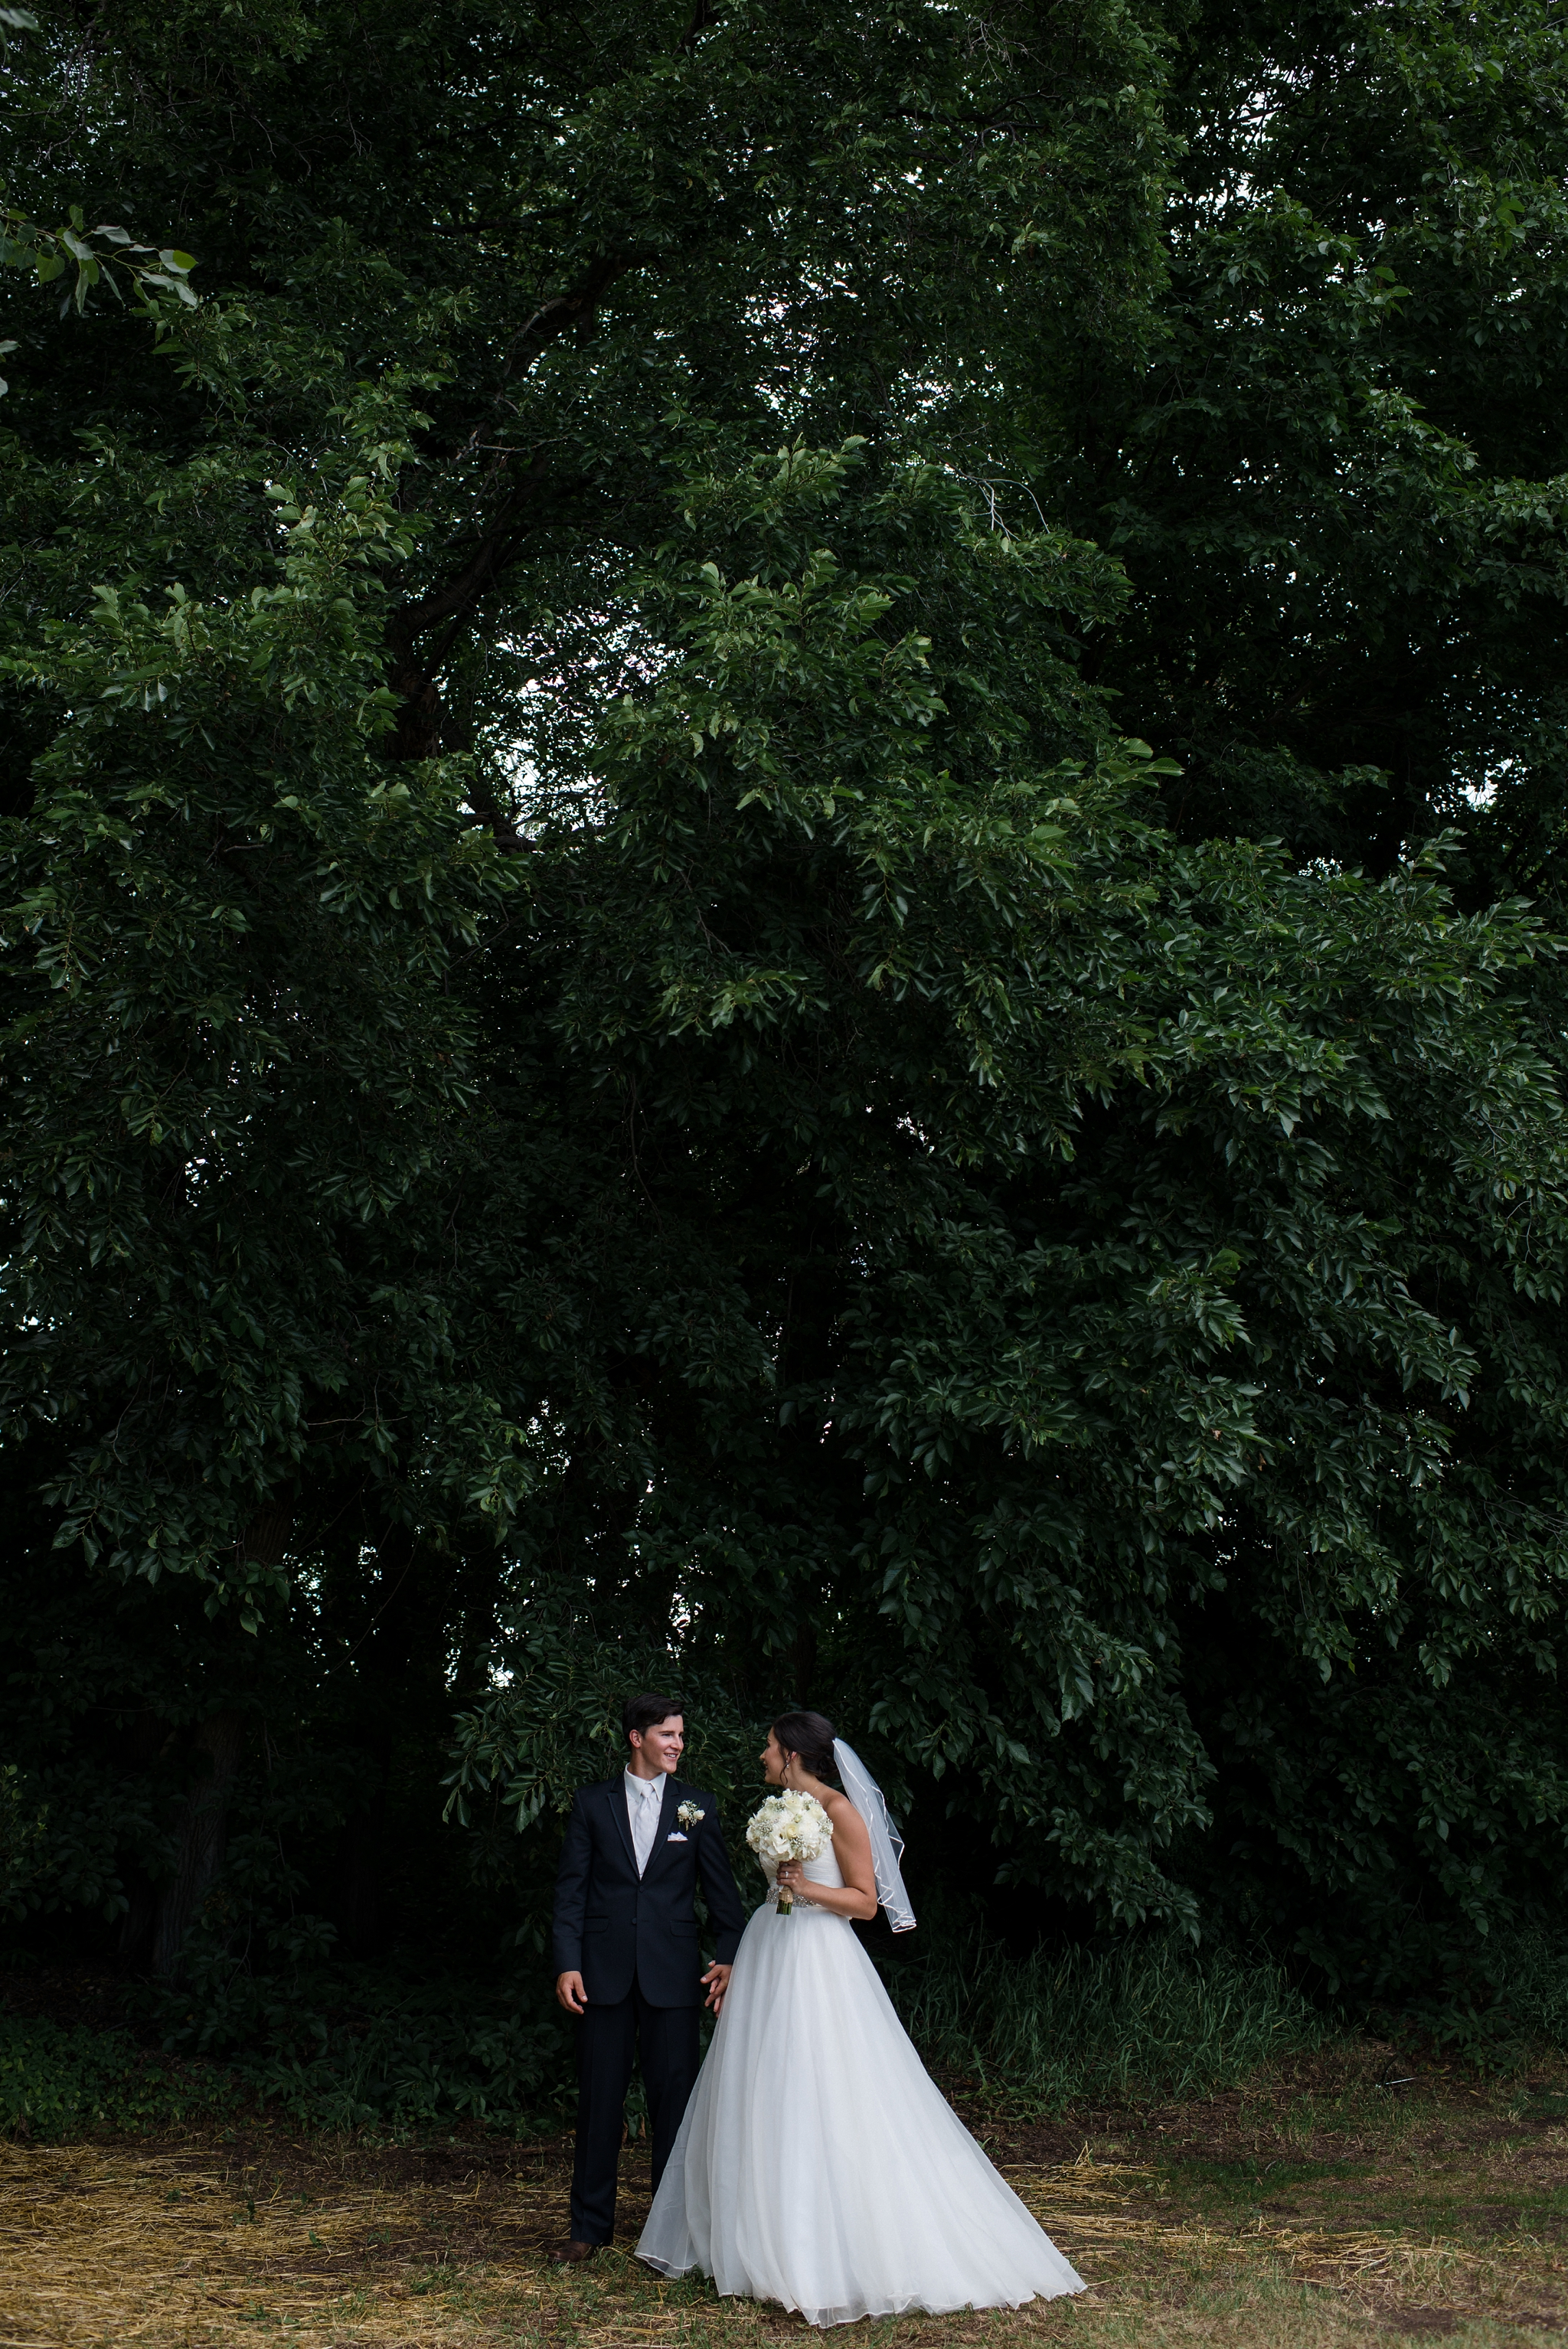 kaihla_tonai_intimate_wedding_elopement_photographer_0062